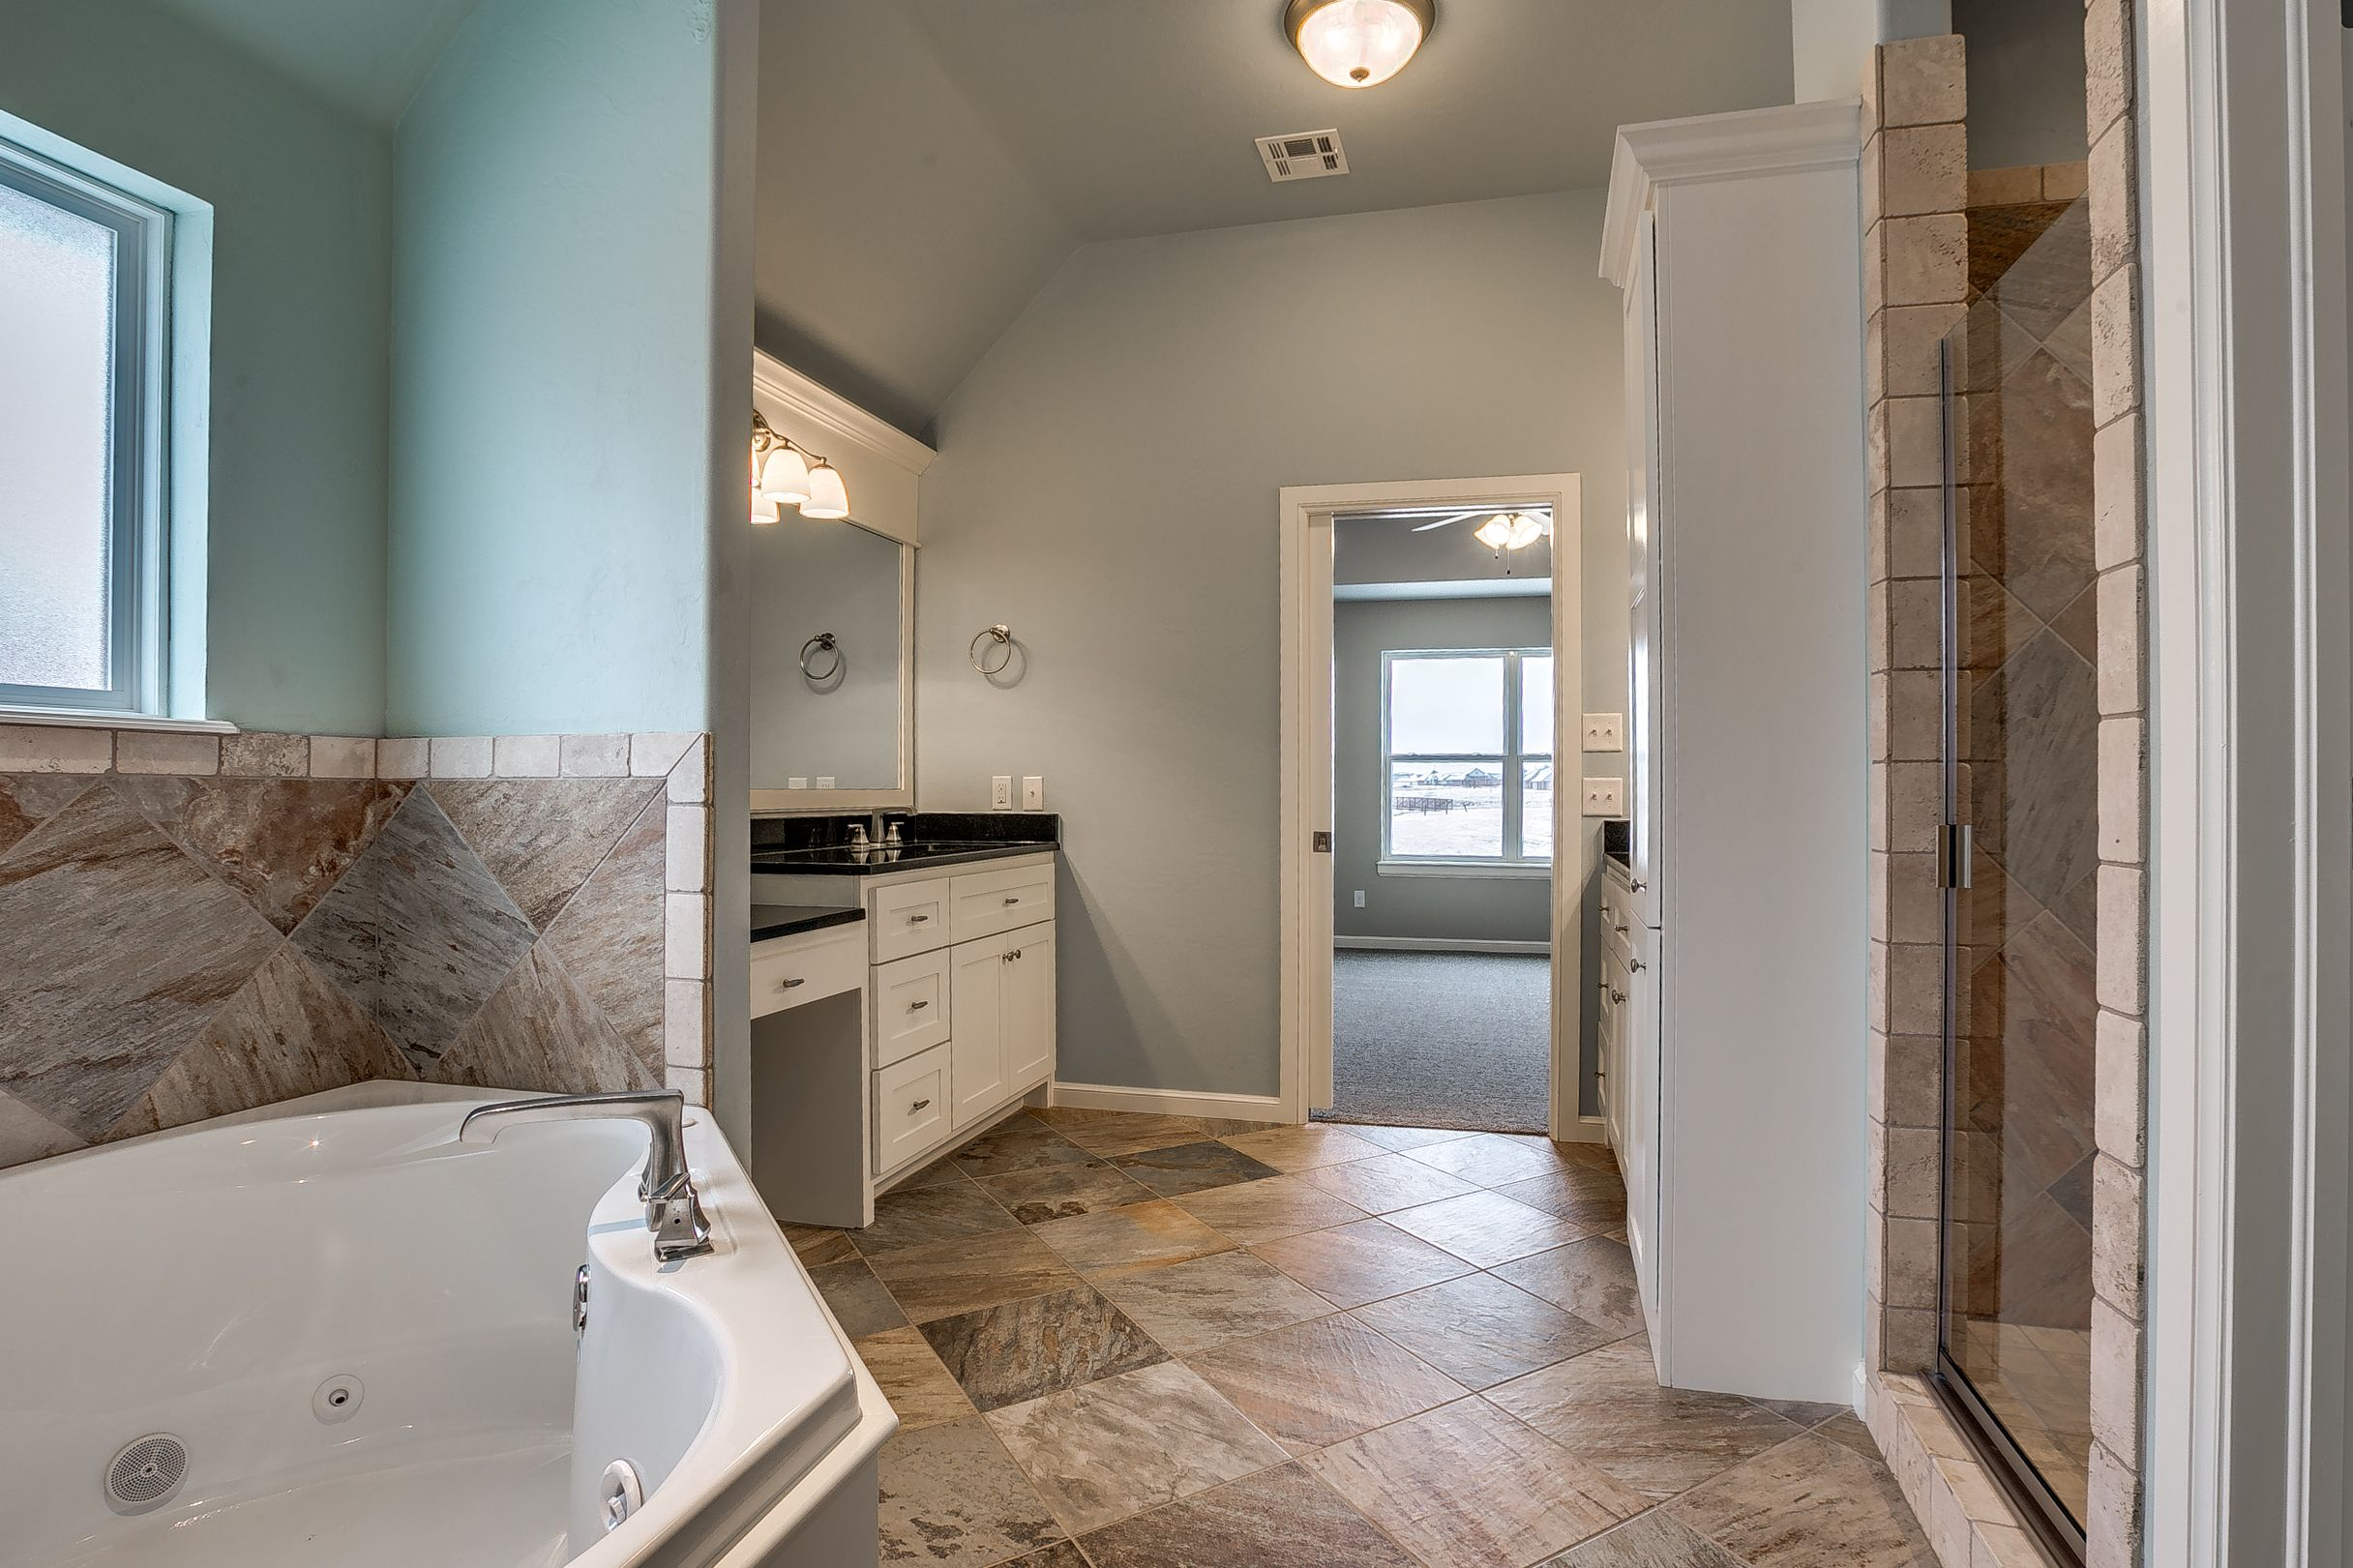 Sherwin Williams Sea Salt wall color slate supremo winter tile